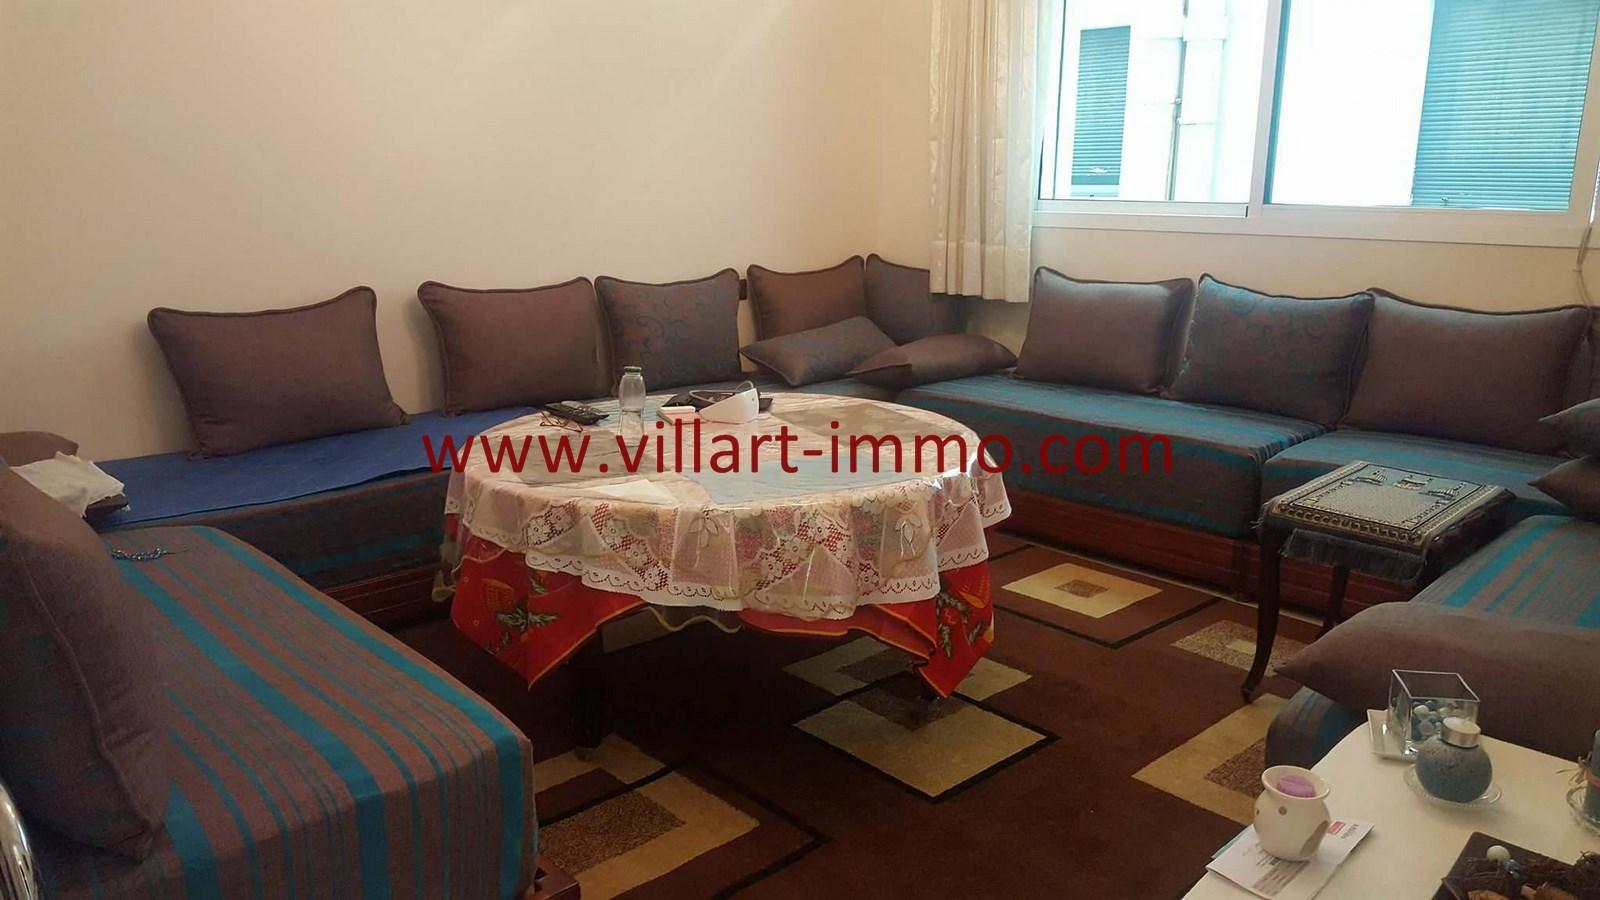 8-Vente-Appartement-Centre-ville-Tanger-Chambre 3-VA531-Villart Immo